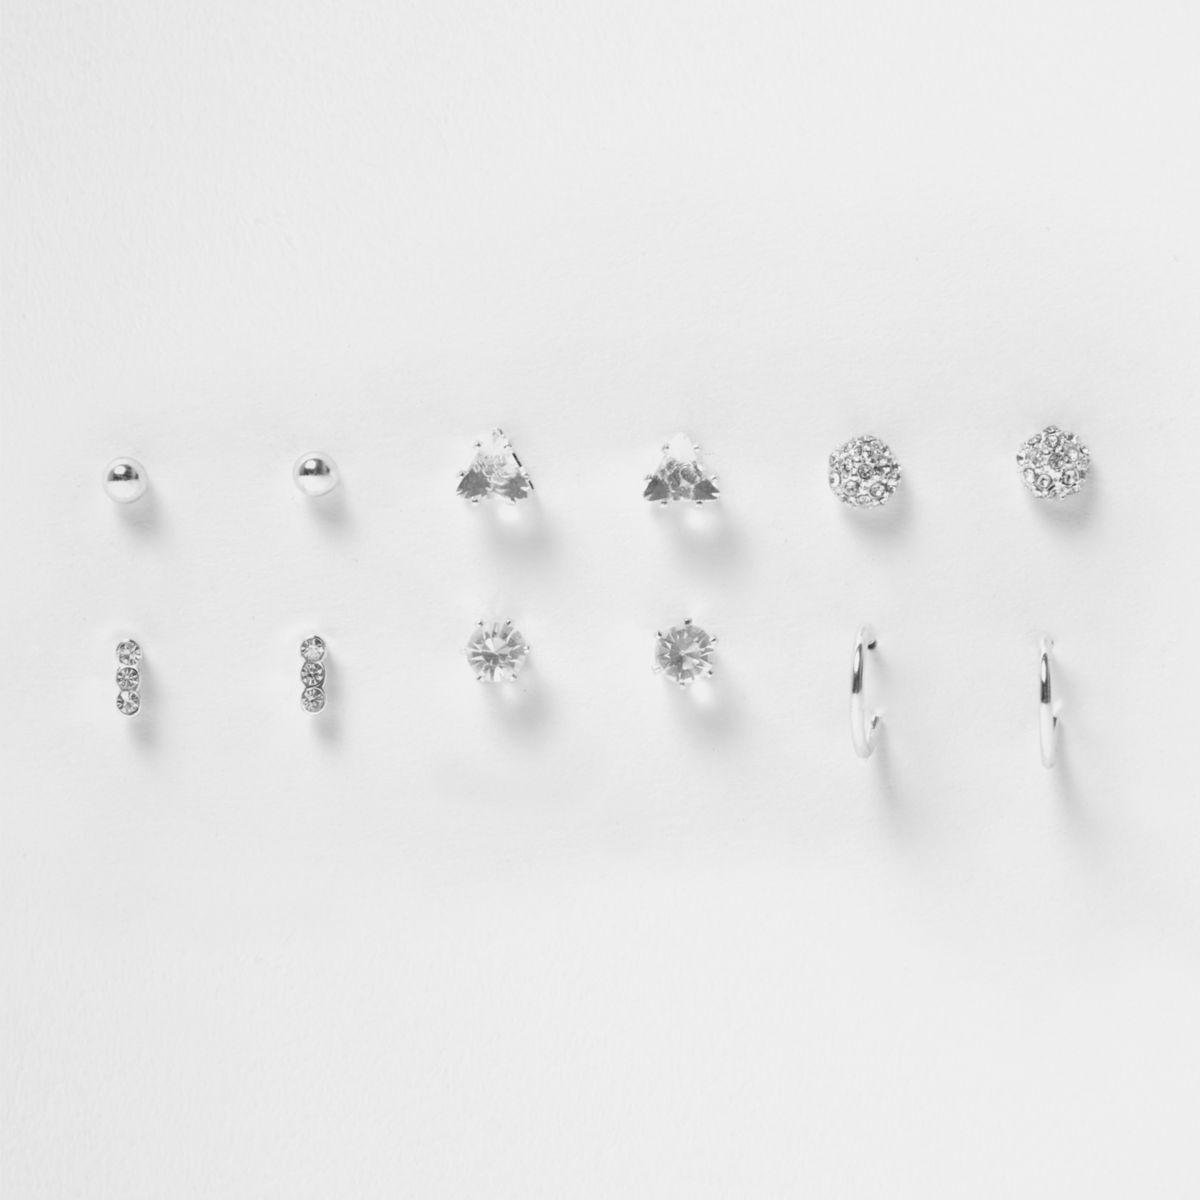 Silver tone rhinestone stud earrings pack